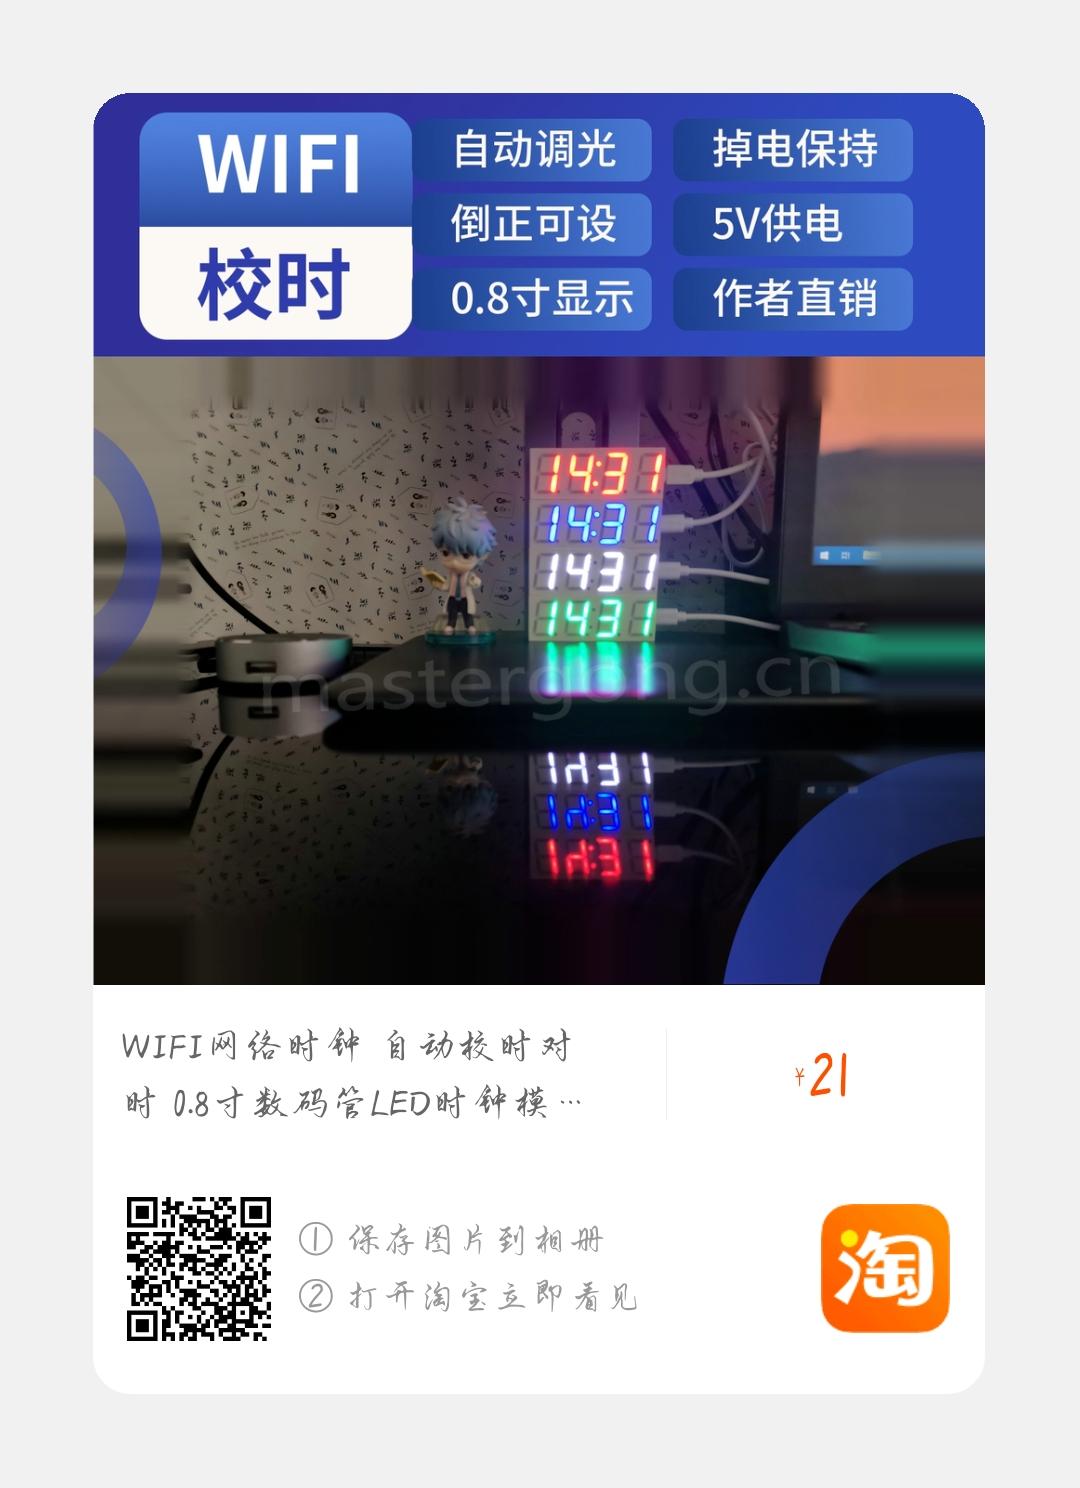 tb_image_share_1589245036930.jpg